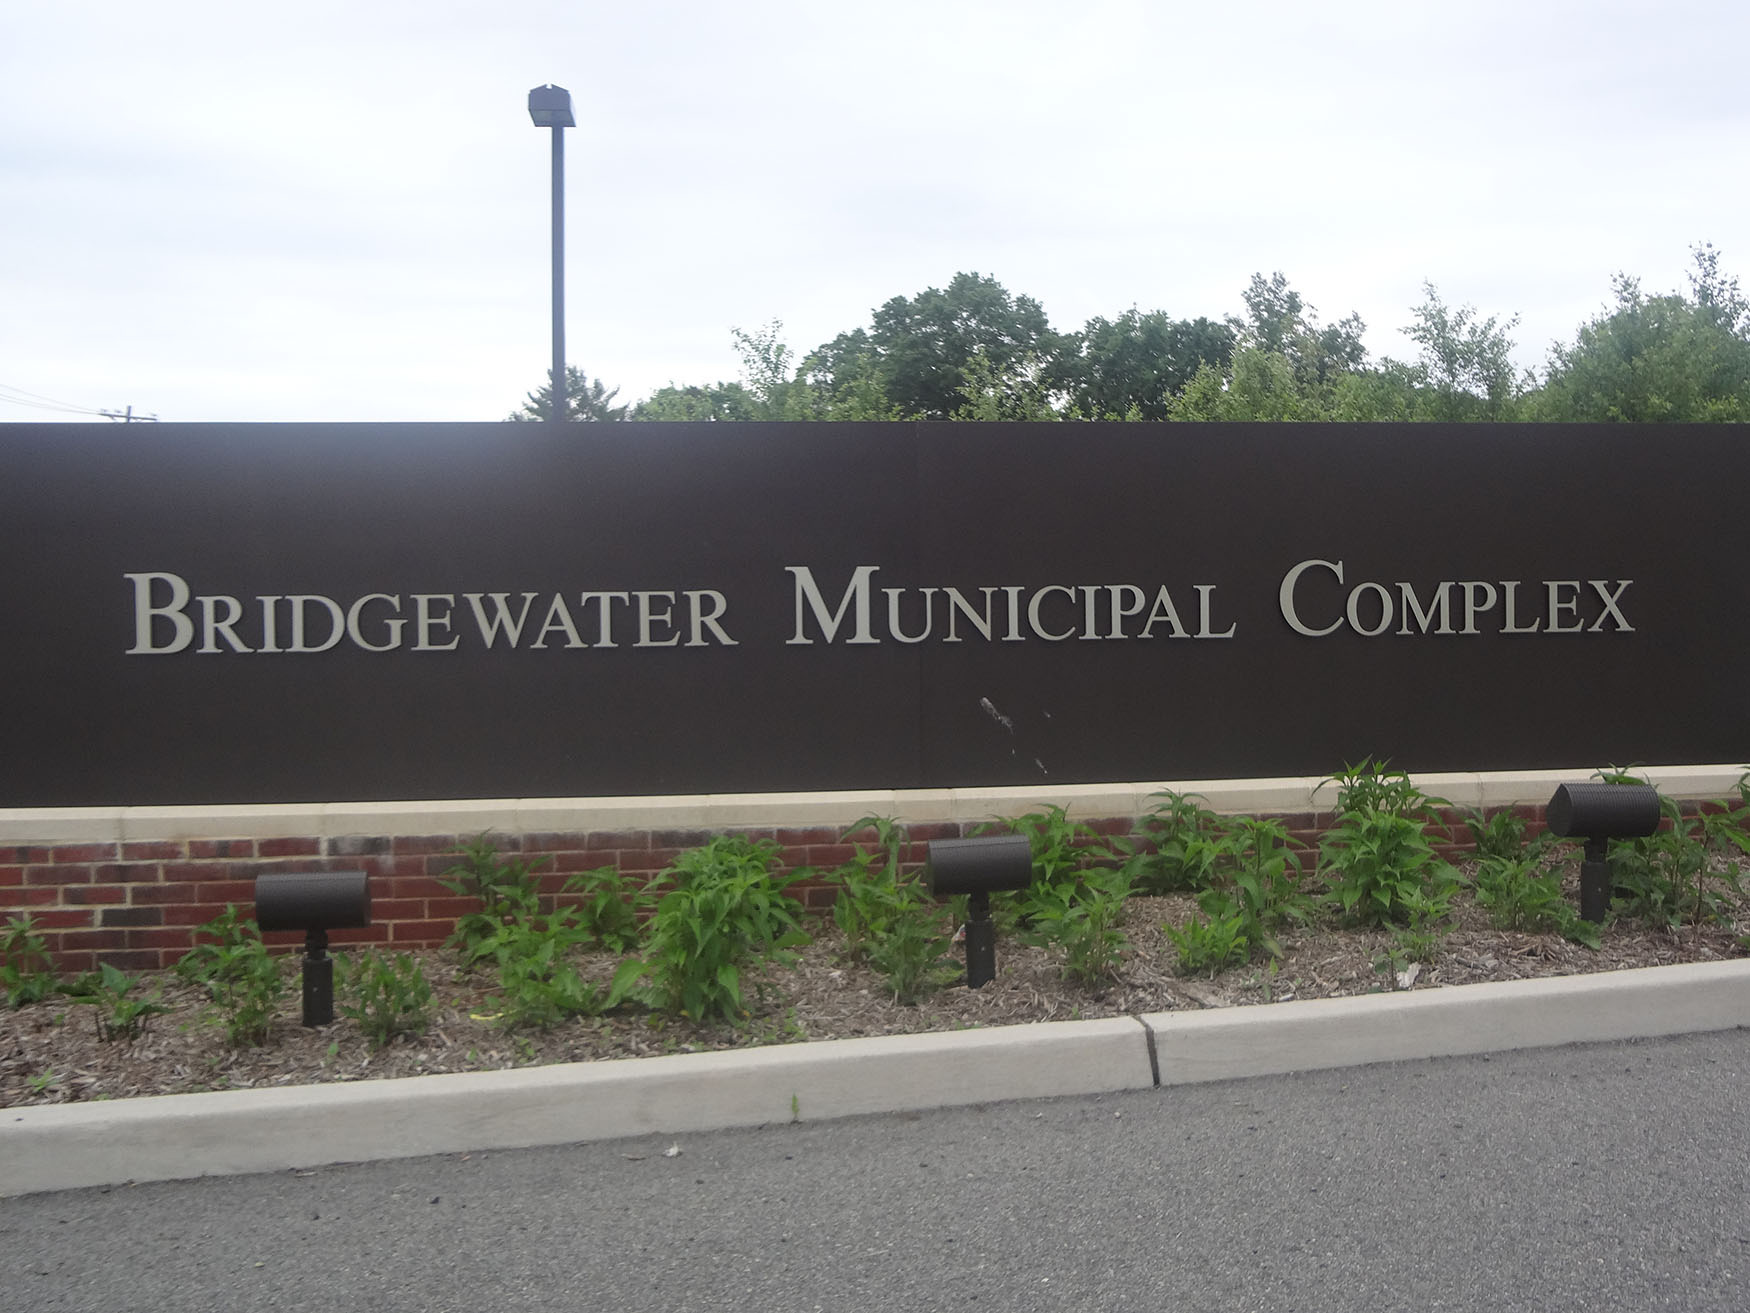 801465c6afd0cedddcd8_Bridgewater_municipal.jpg